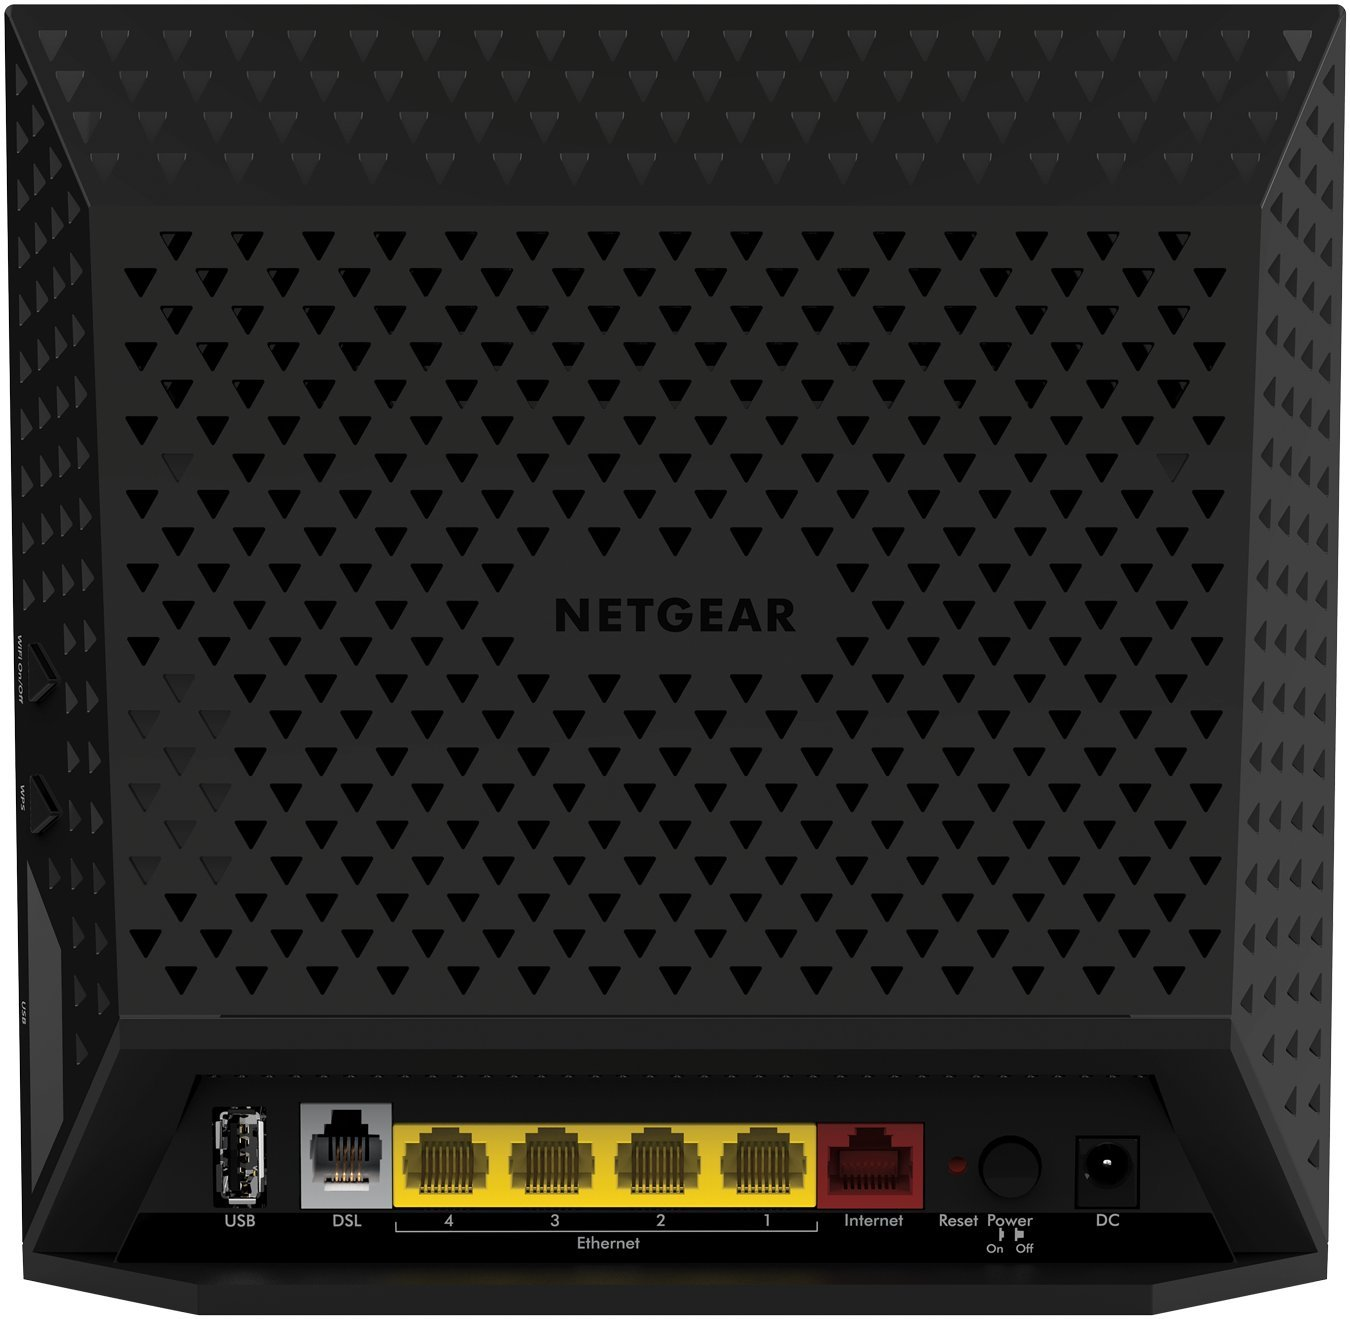 Netgear Ac1600 Wifi Vdsl Adsl Modem Router 80211ac Rj11 Connector Wiring Diagram Centurylink Dual Band Gigabit D6400 100nas Computers Accessories